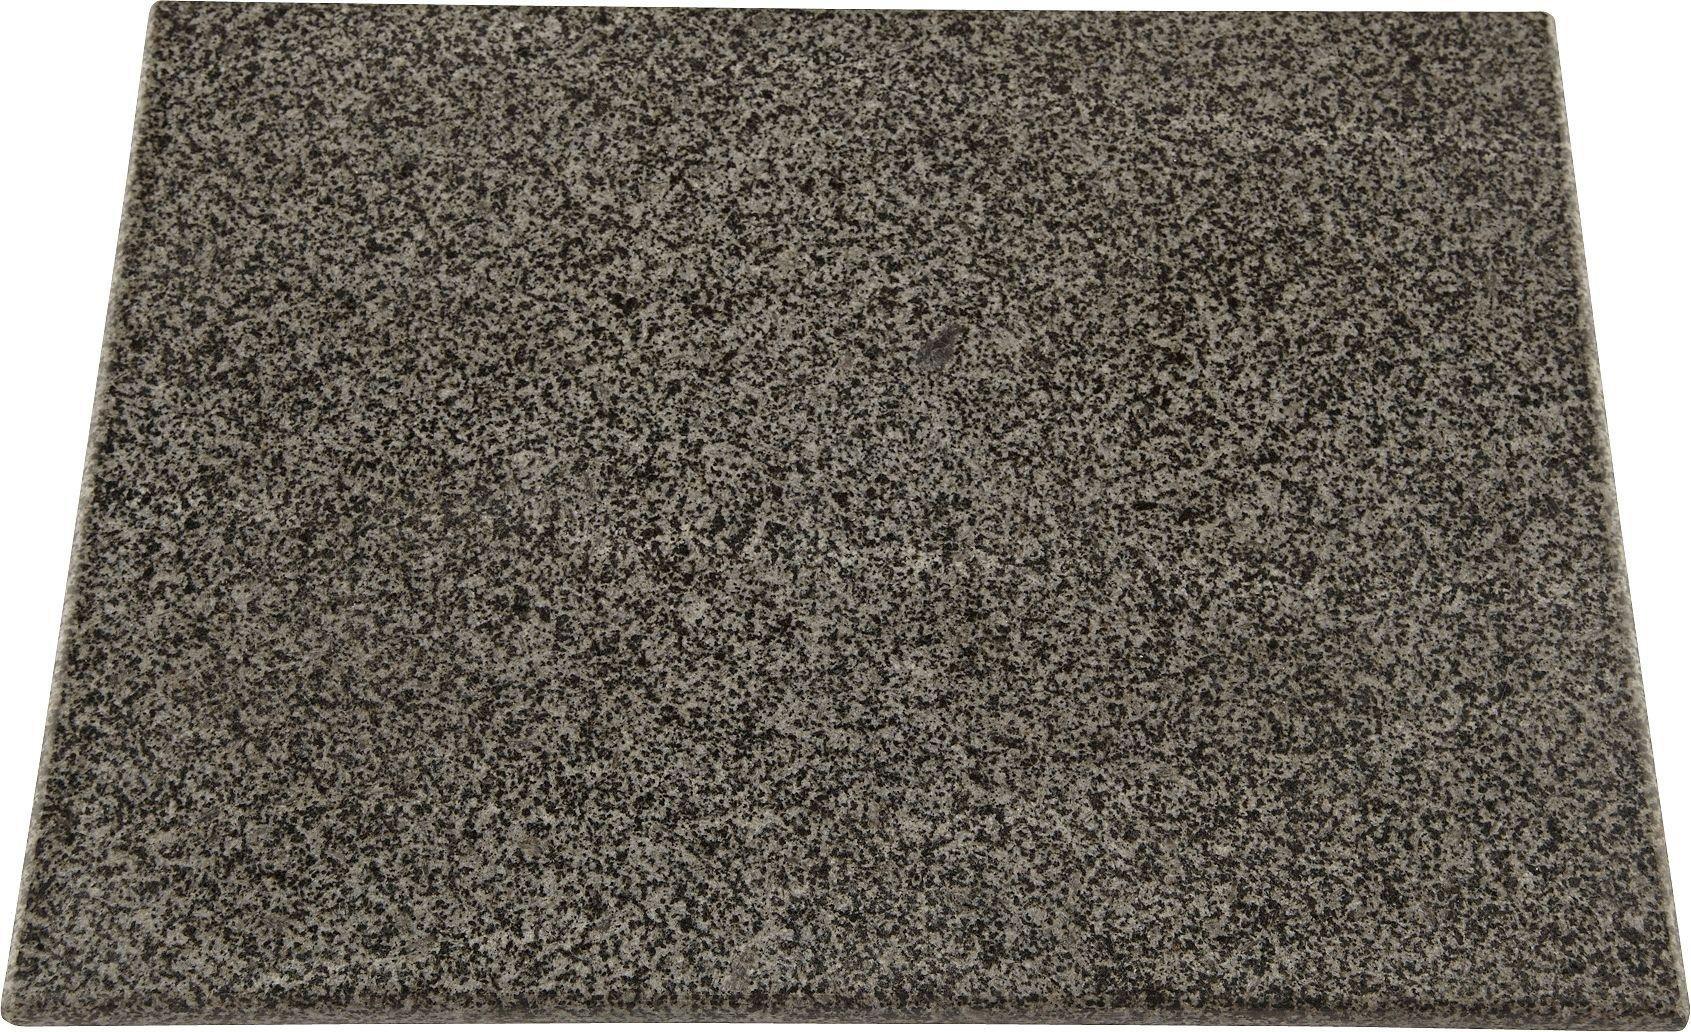 Image of Heart of House - Malton Granite Worktop Saver